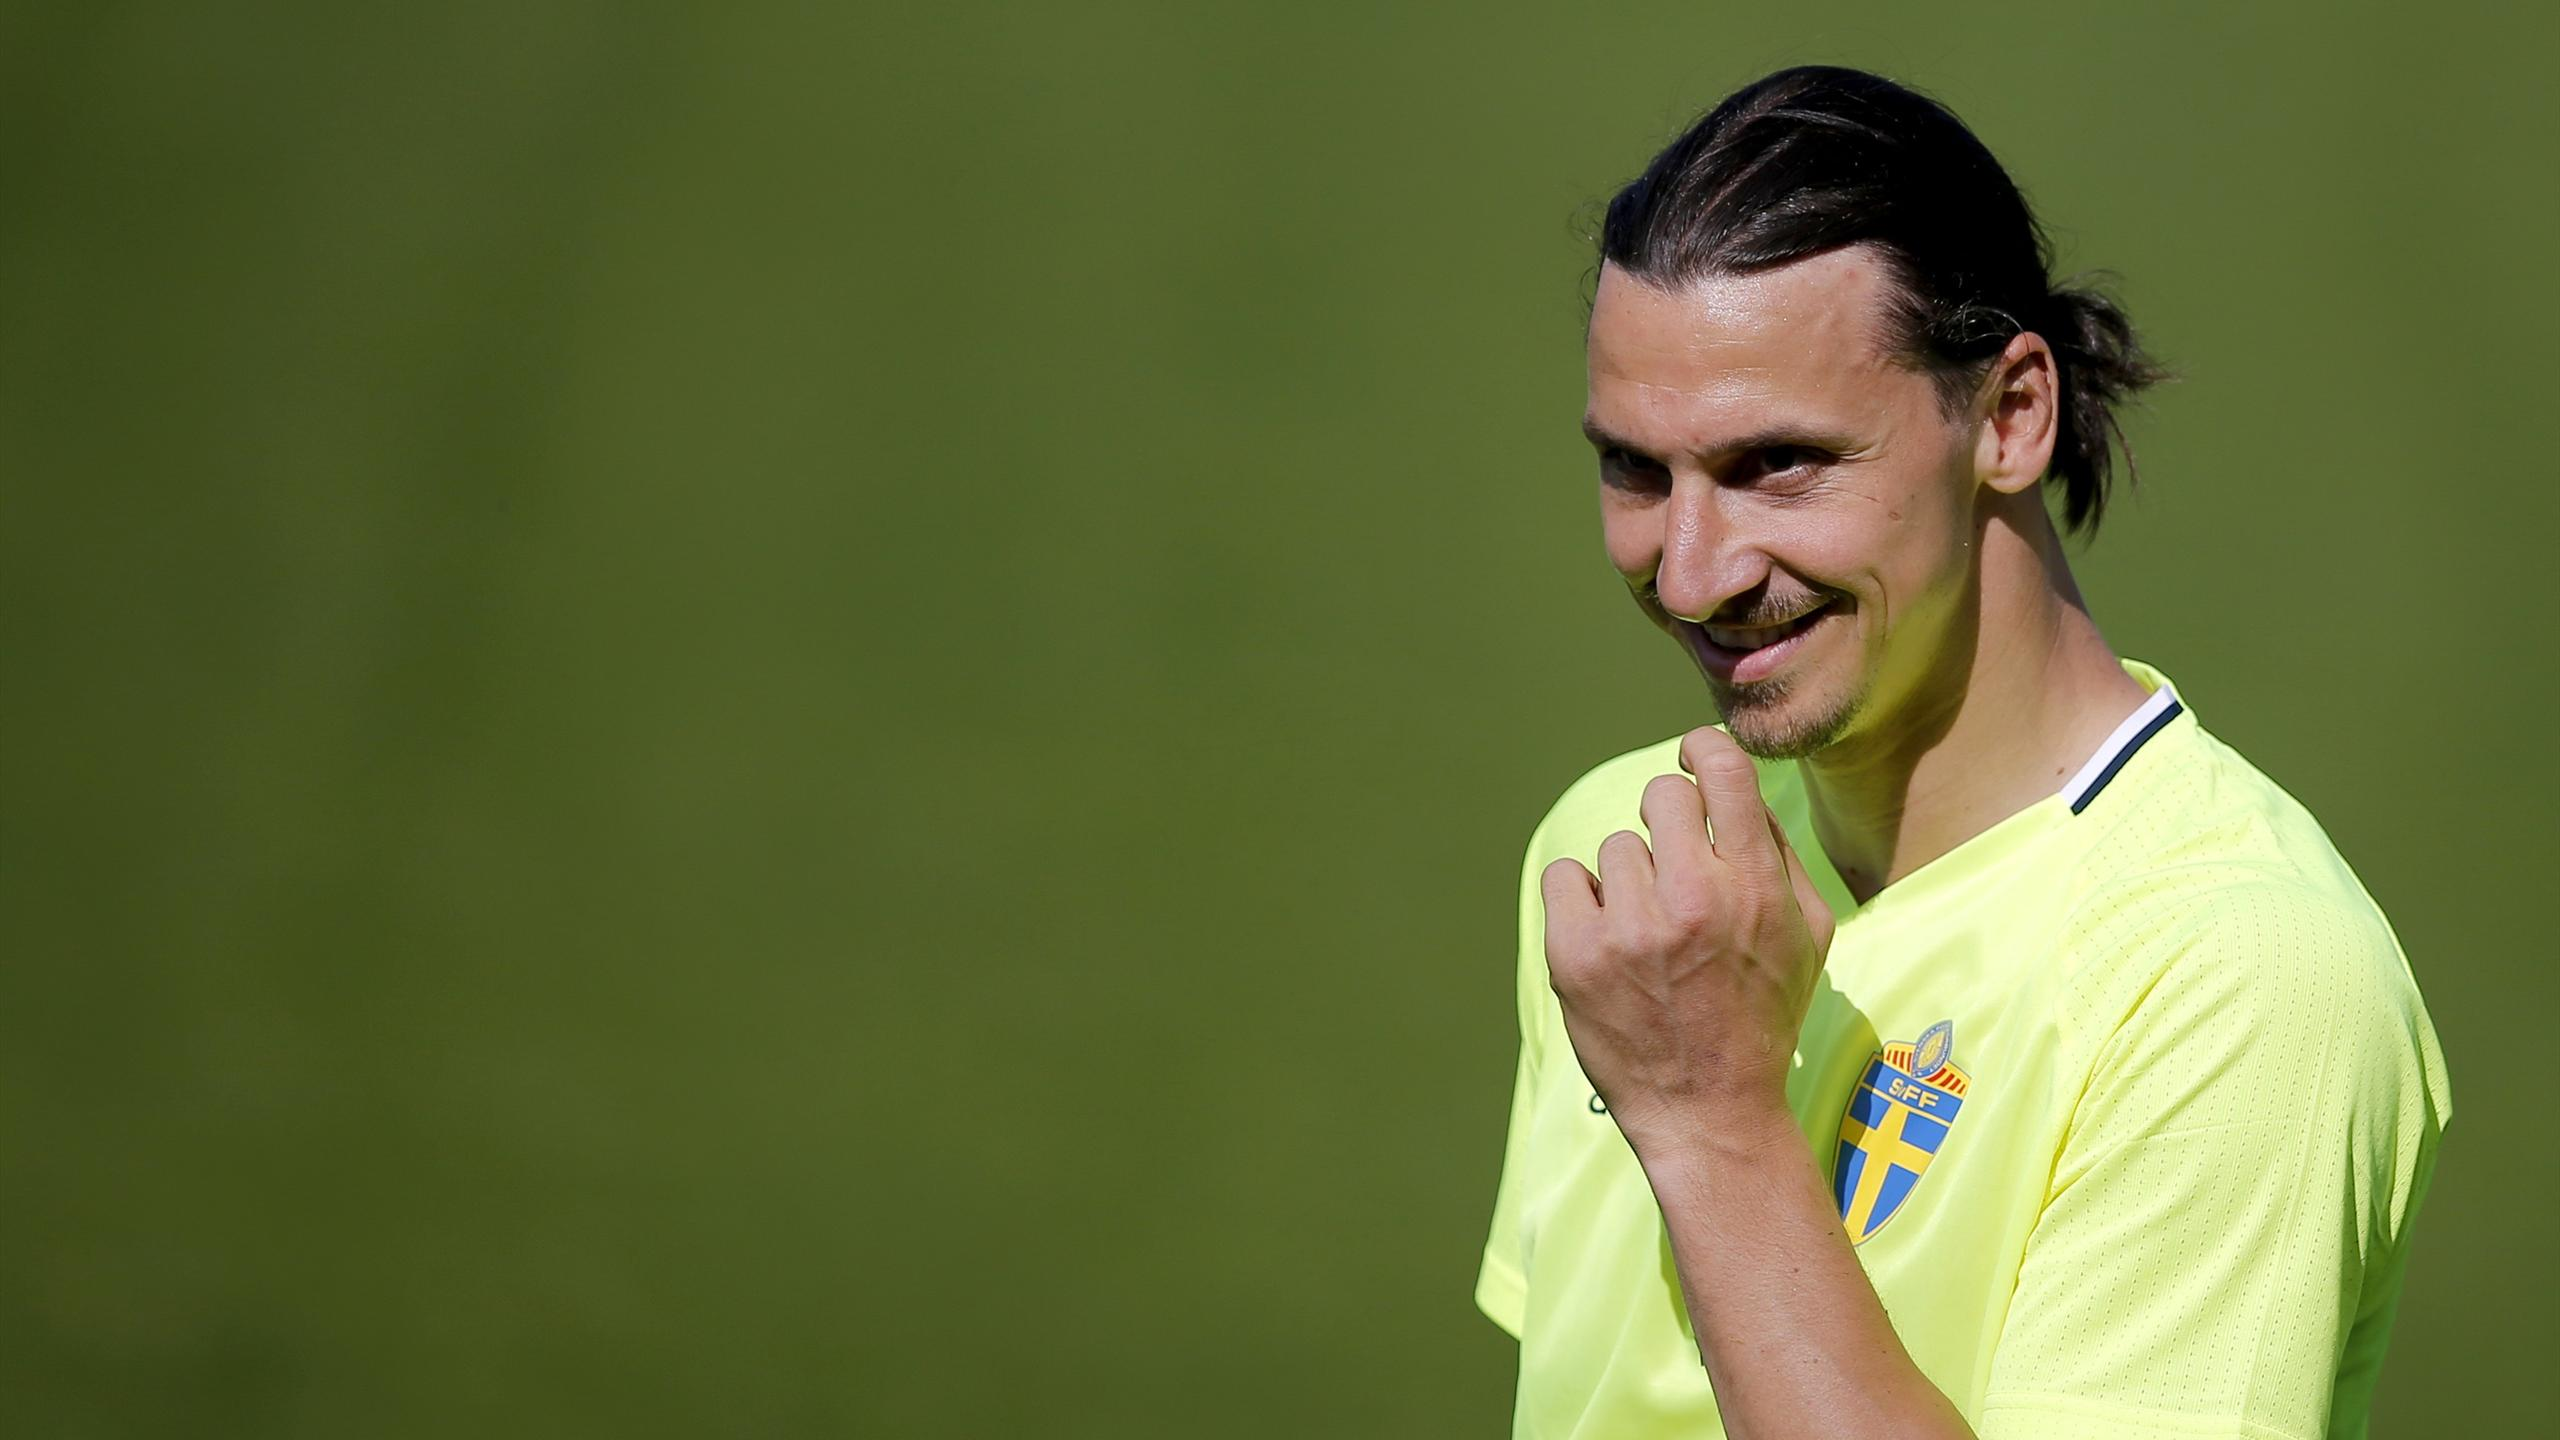 Sweden's Zlatan Ibrahimovic during training.